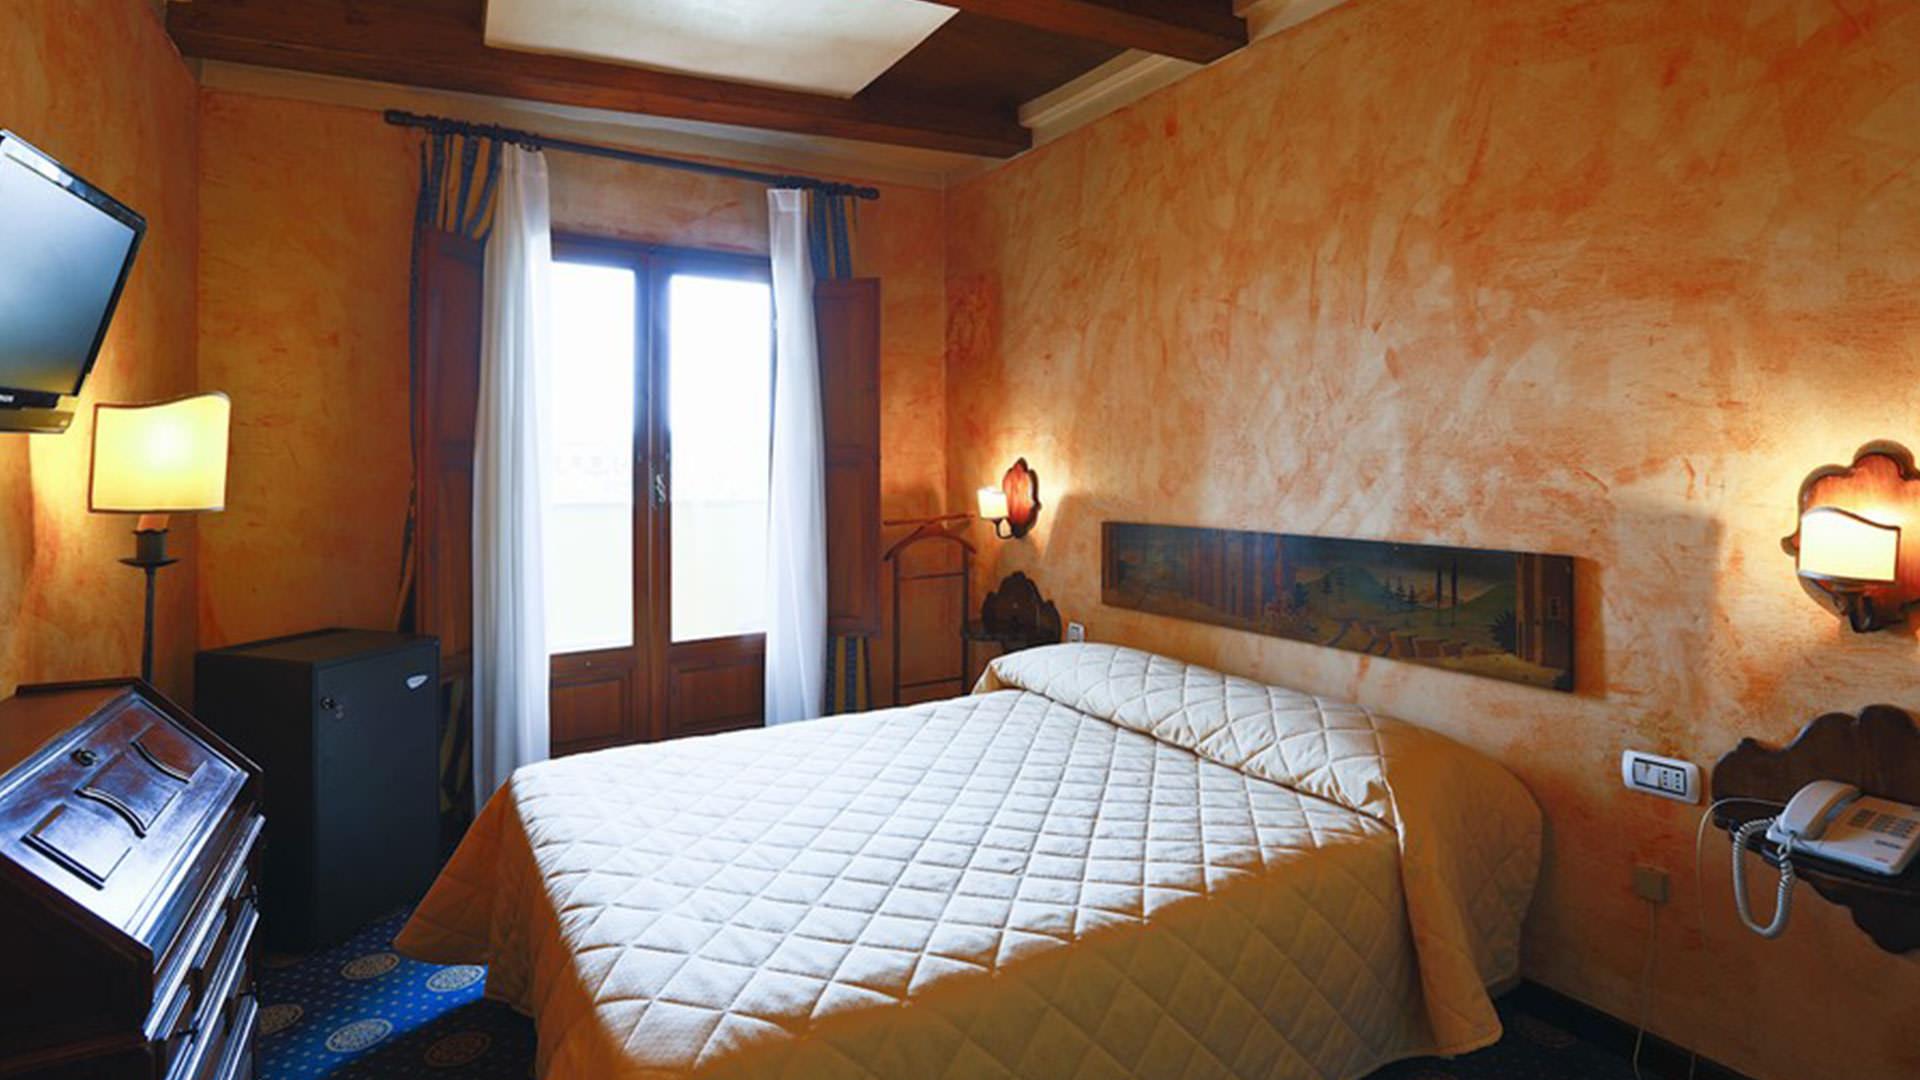 Florence Hotel Hotel Croce Di Malta Official Site